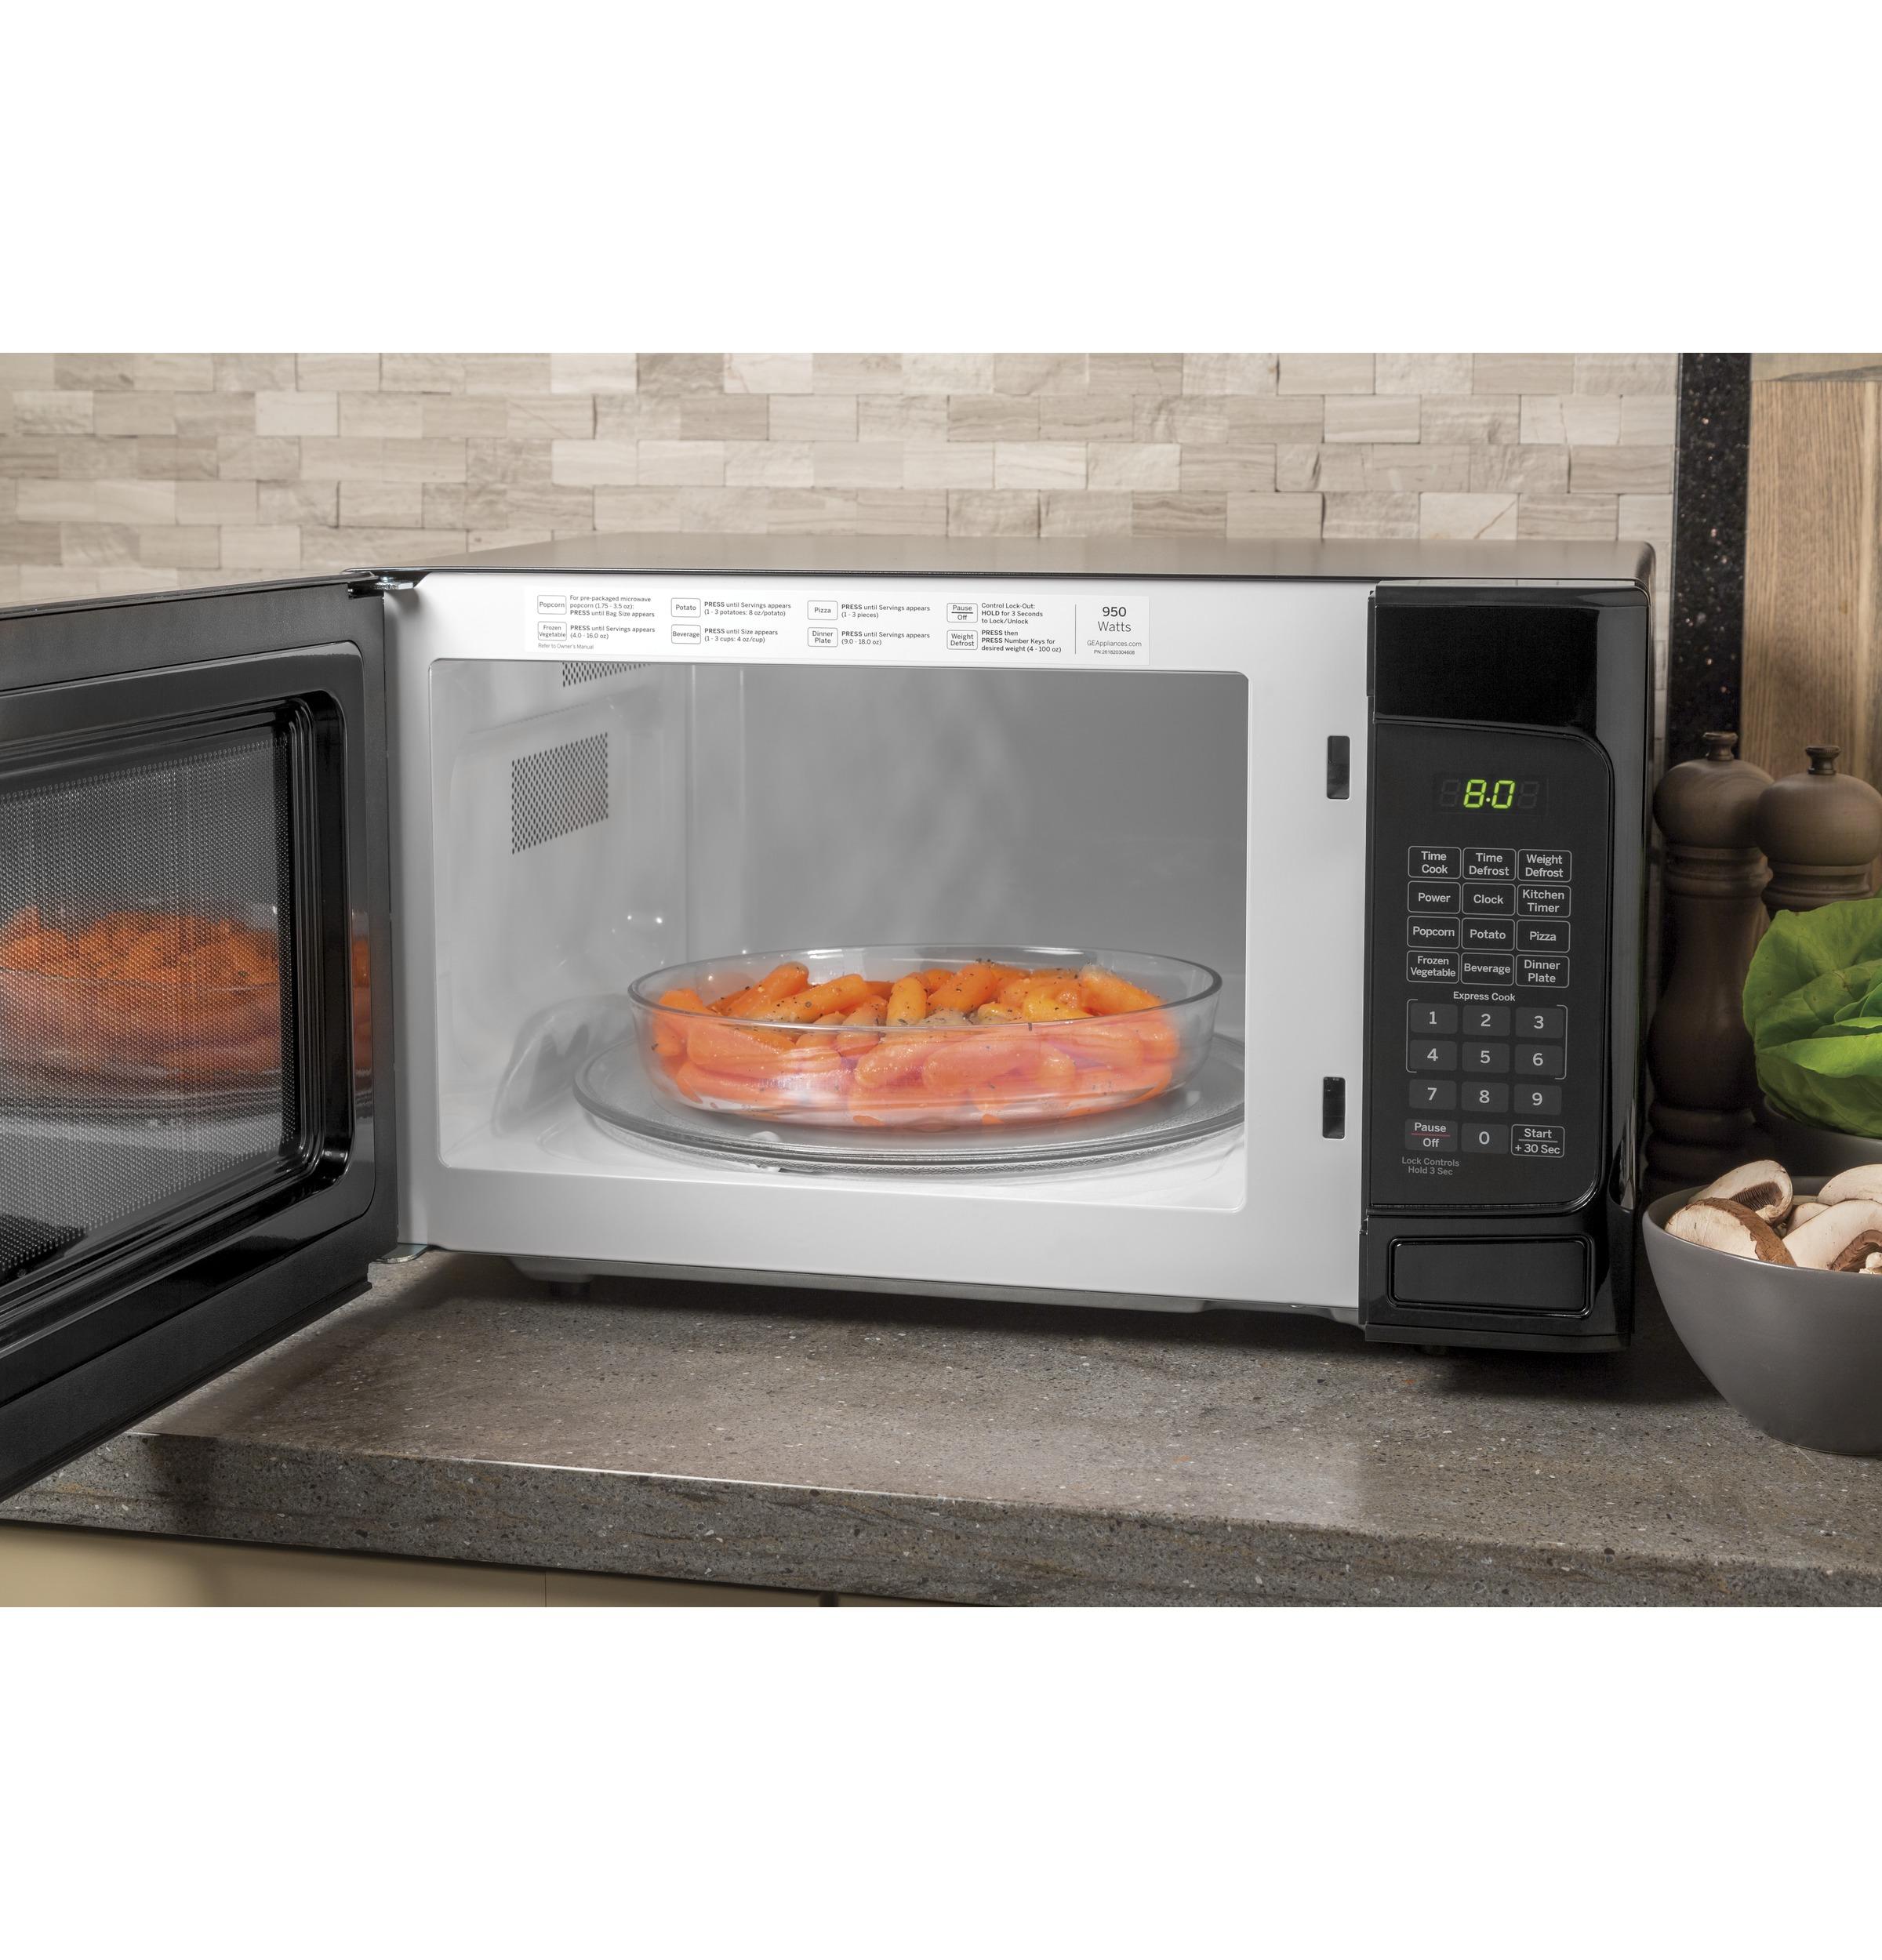 Model: JESP113DPBB | GE GE® 1.1 Cu. Ft. Capacity Countertop Microwave Oven